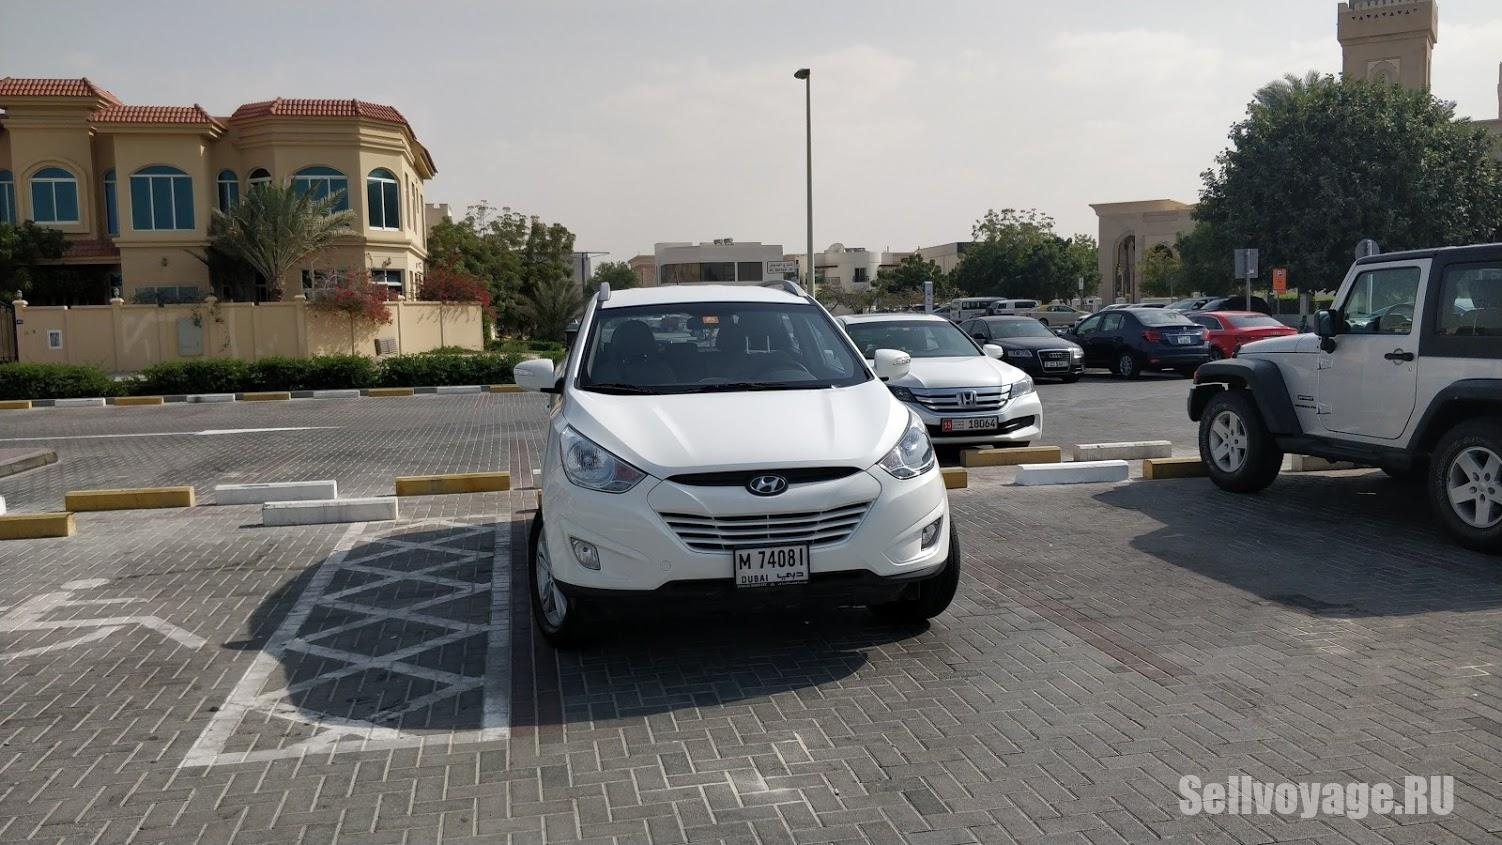 Парковка в Дубае на улице